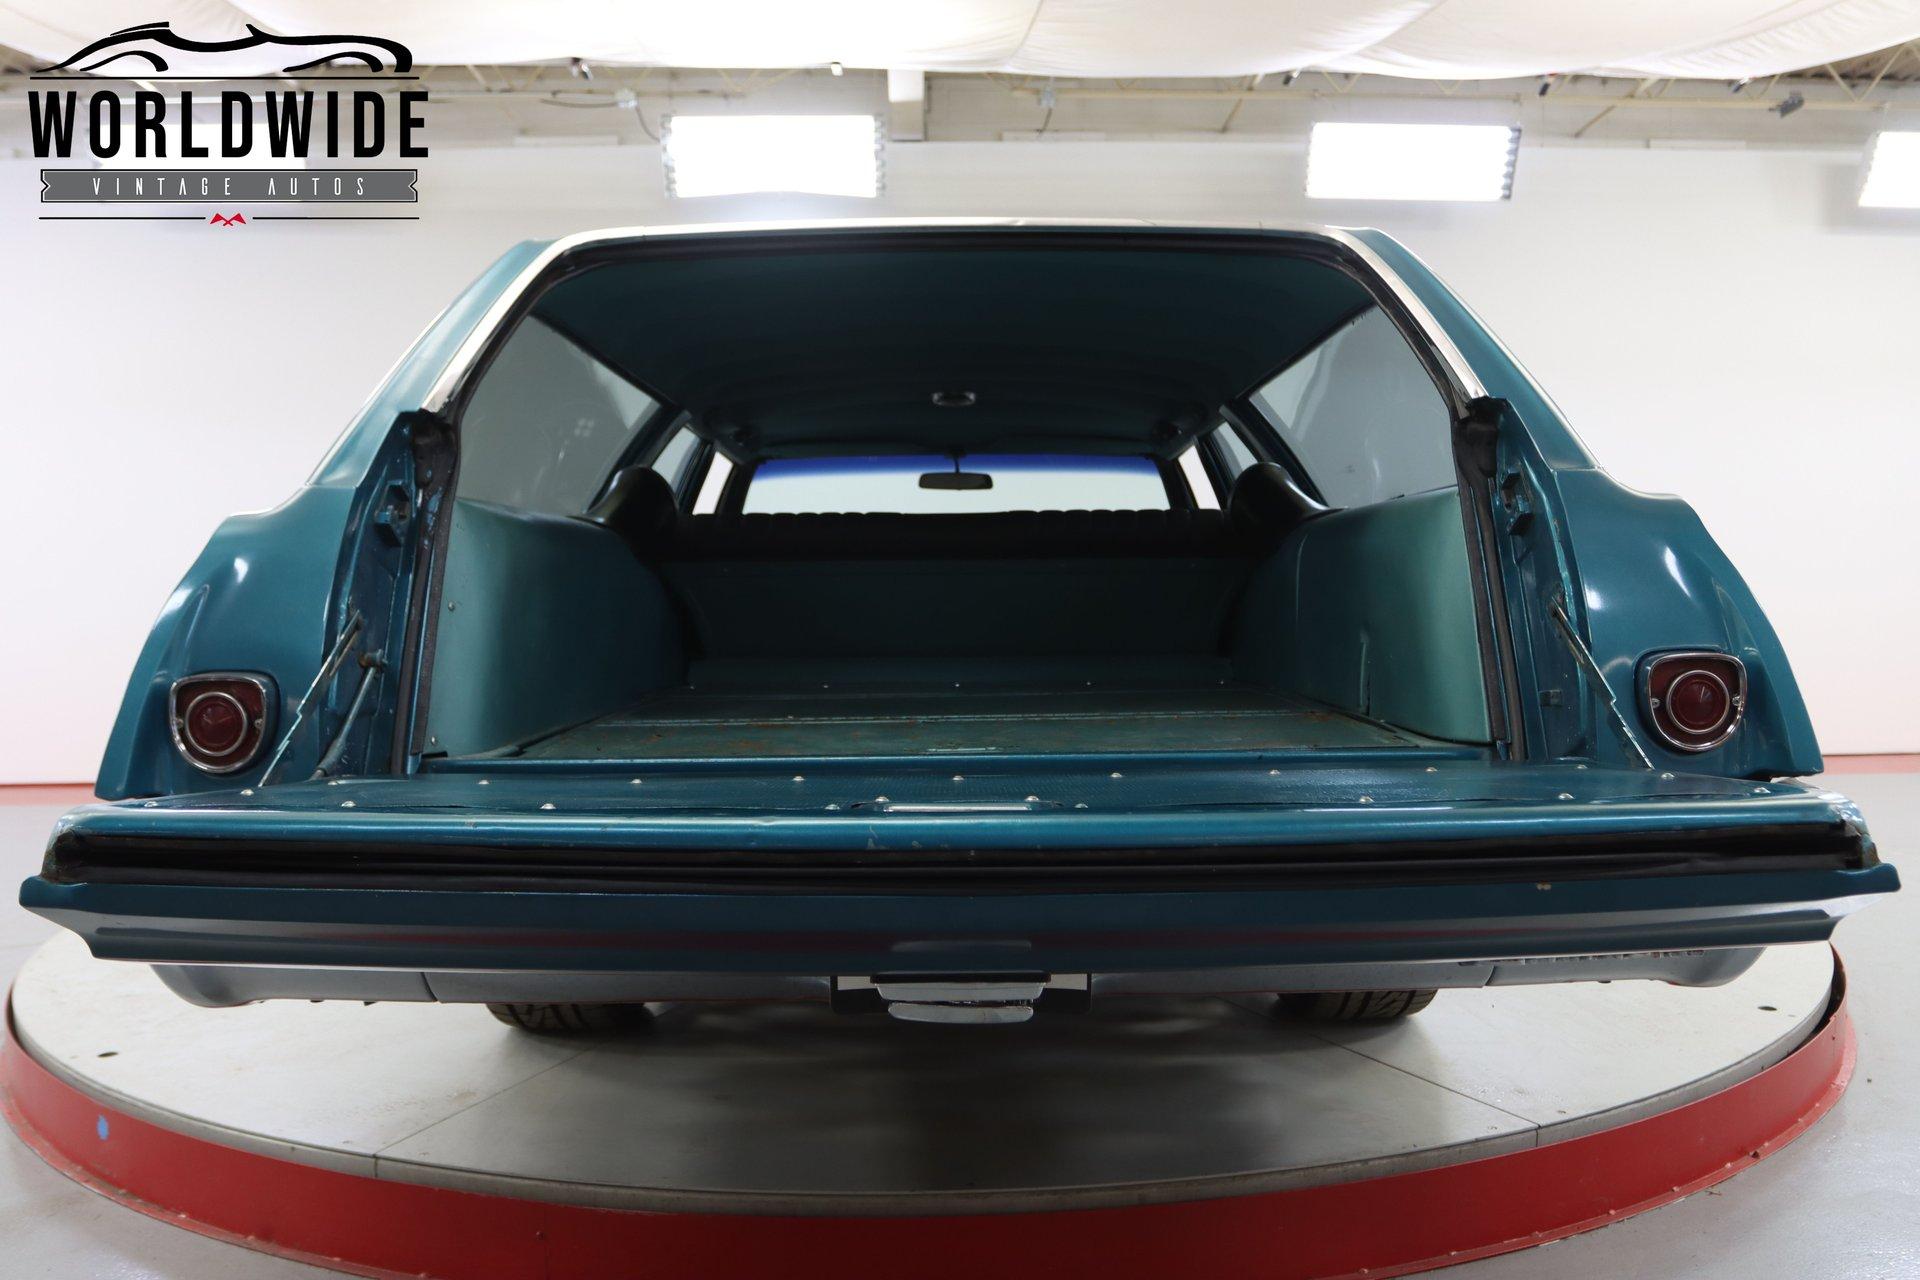 1968 Chevrolet Bel Air Wagon